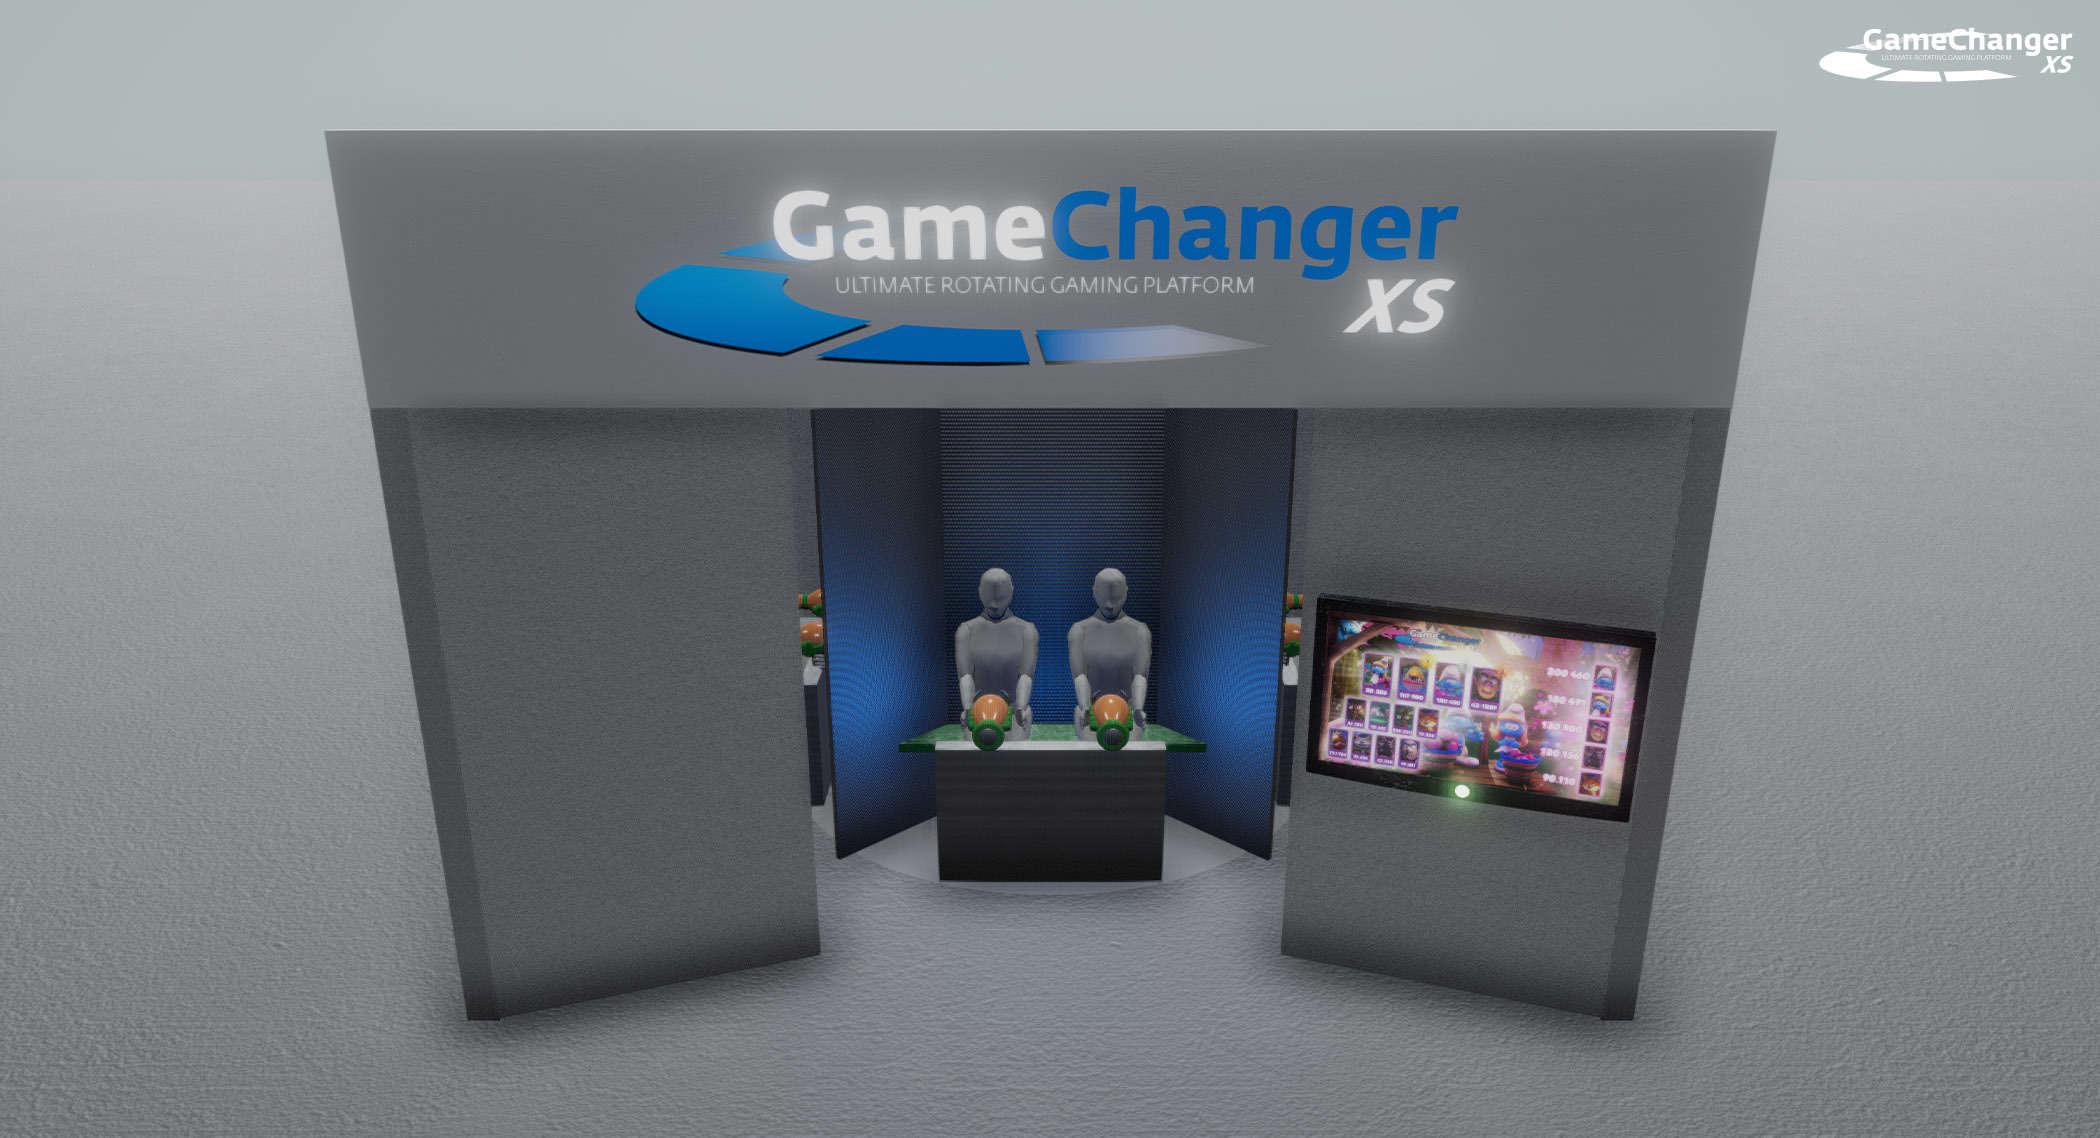 Game Changer Xs 2